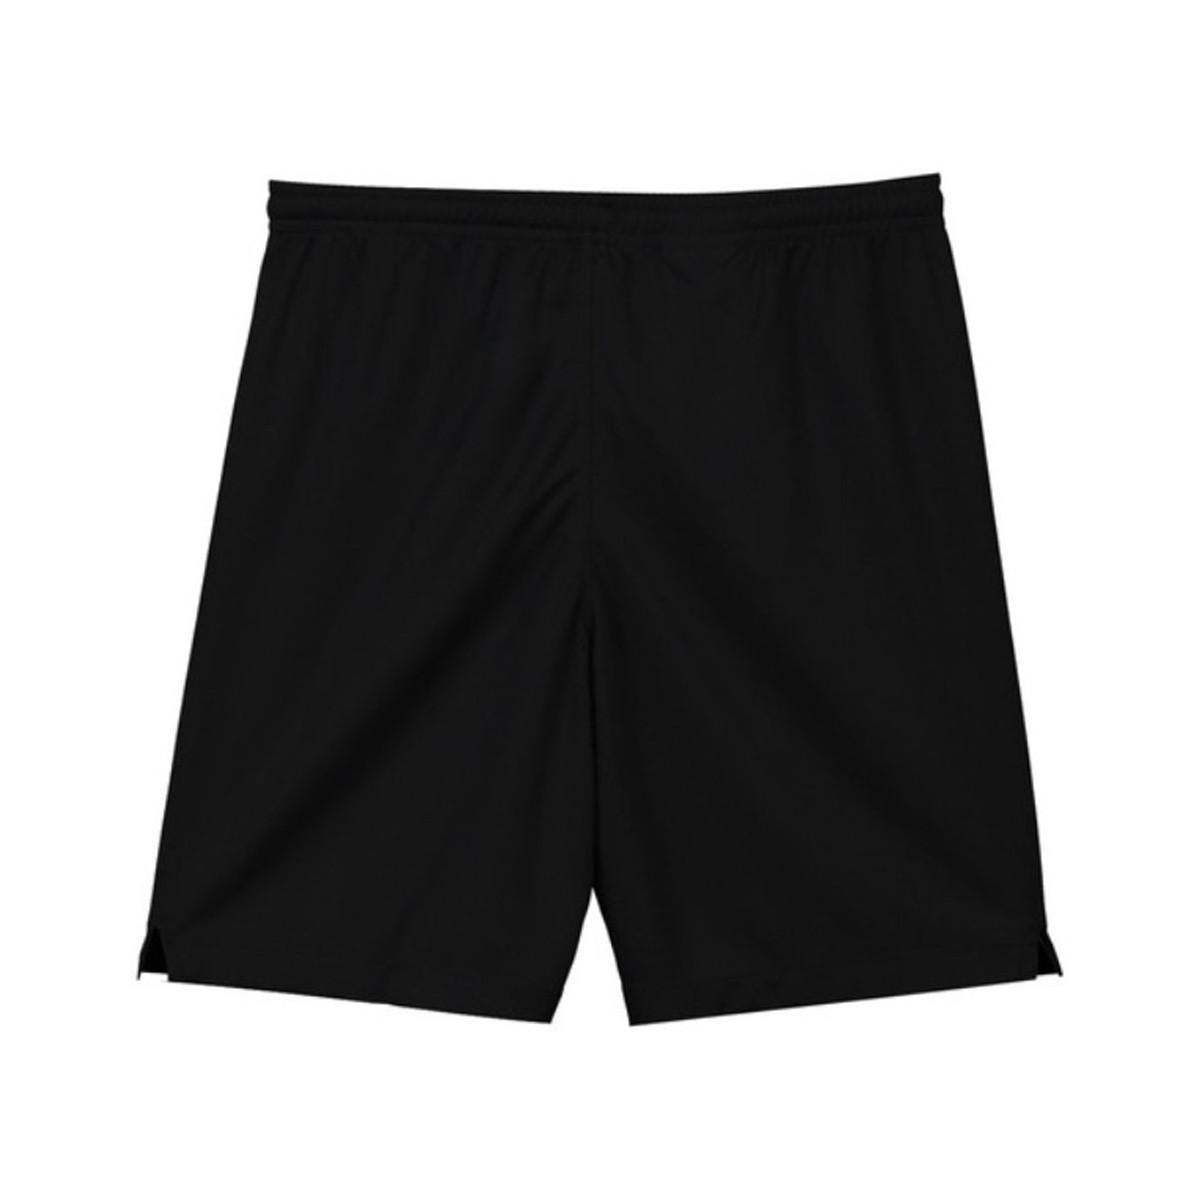 6a51fdfda34 Nike 2018-2019 Barcelona Home Goalkeeper Shorts - Kids Men s Shorts ...